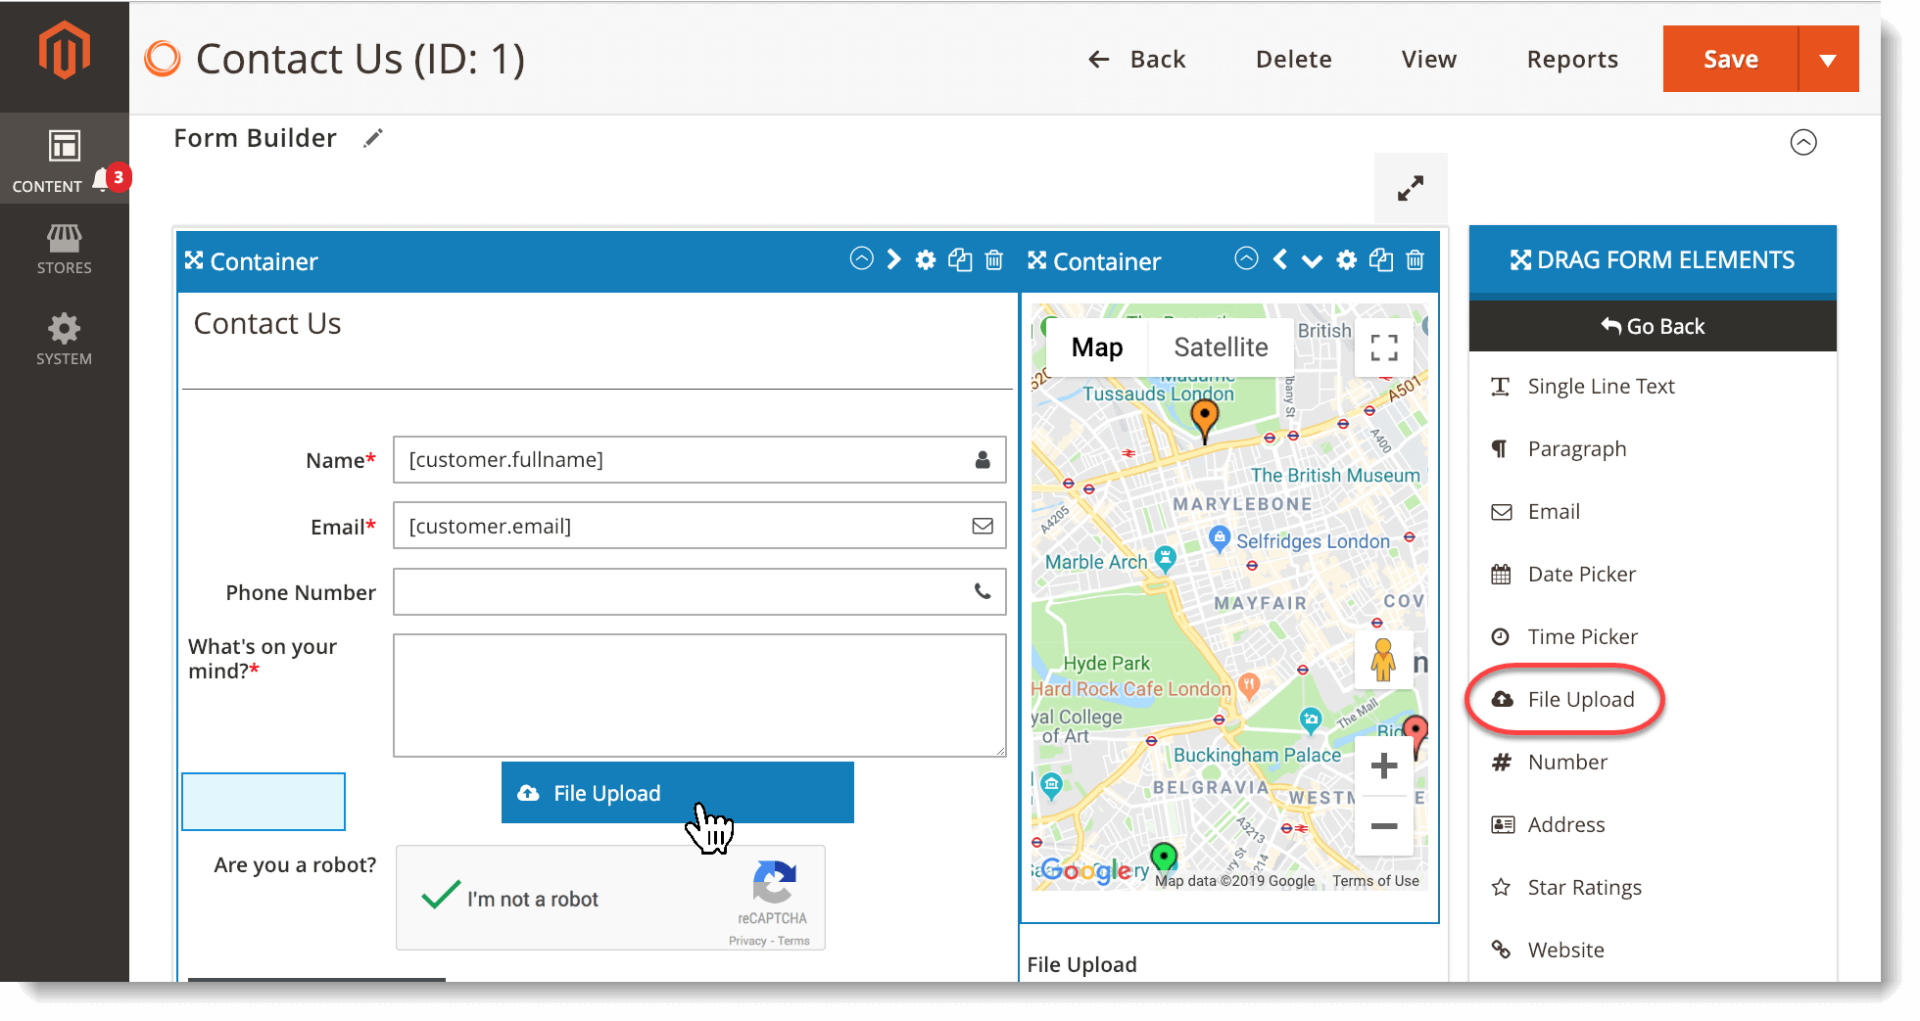 Magento 2 form builder extension   Drag and drop file upload element